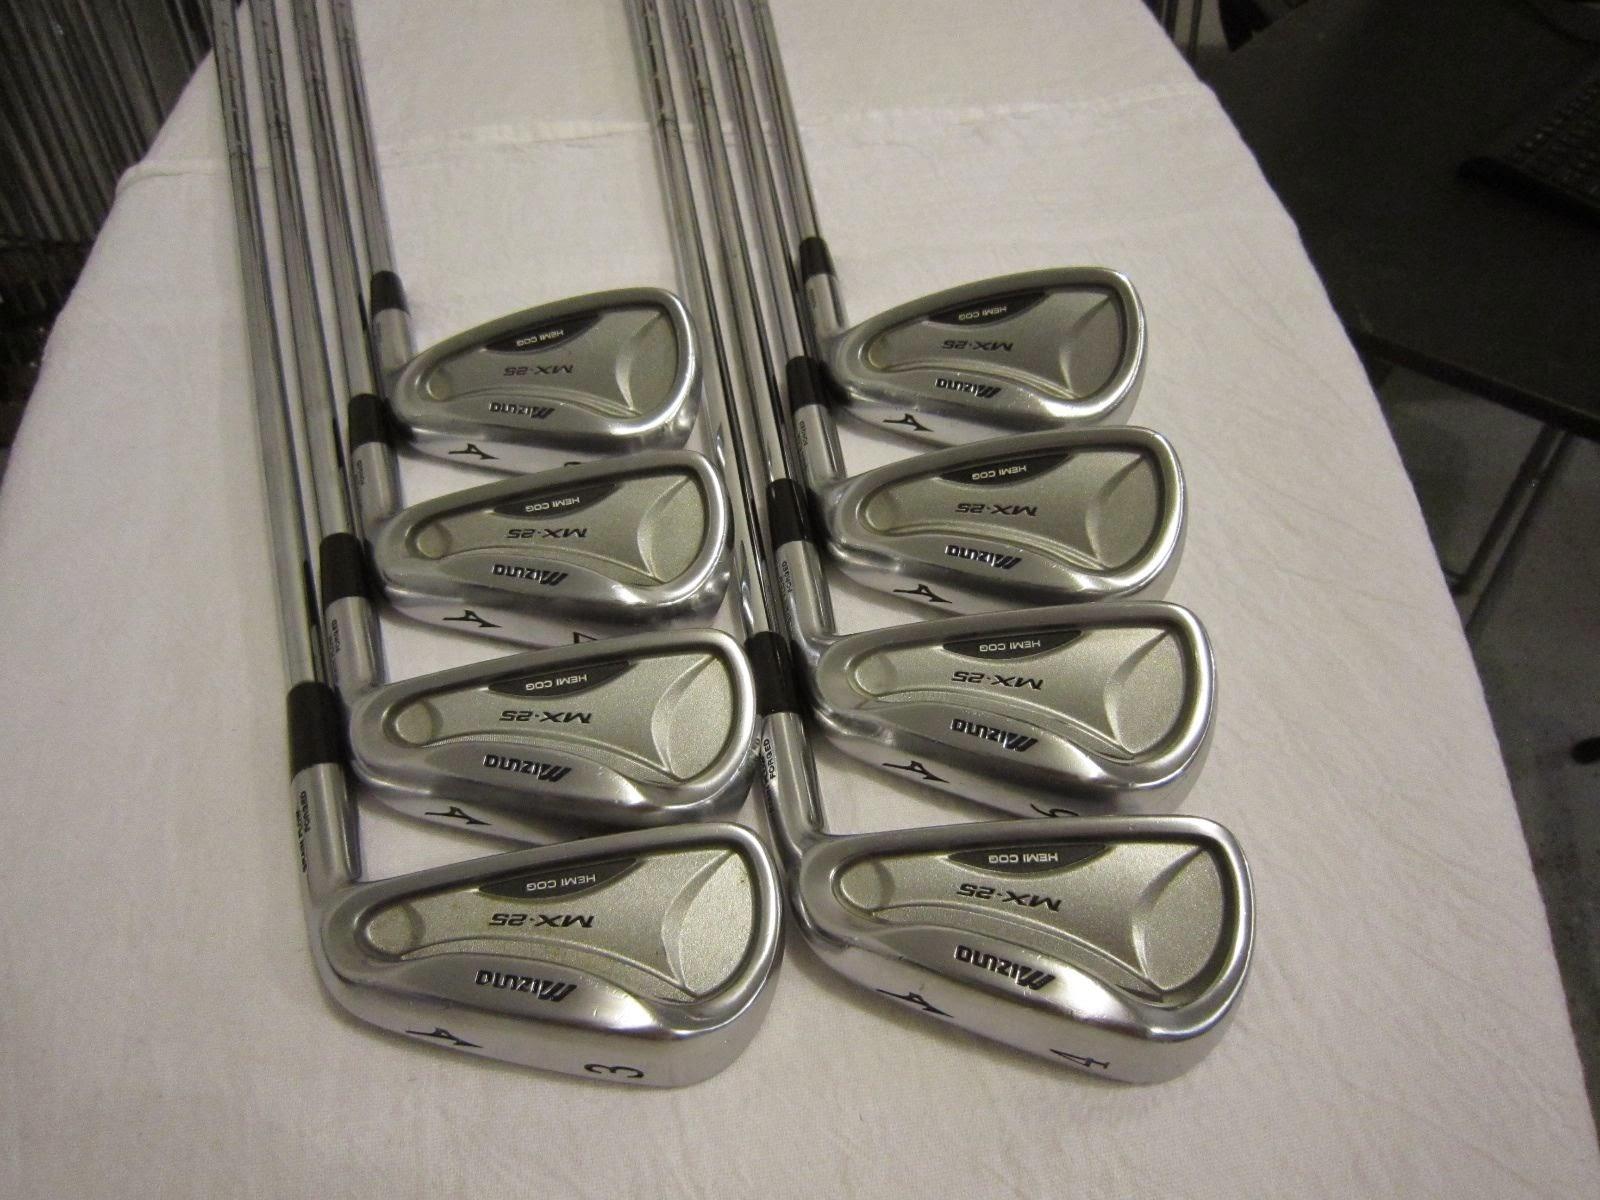 Mizuno MX-25 Iron Set MX25 - 3-PW - Dynalite Gold SL R300 Regular Flex Steel